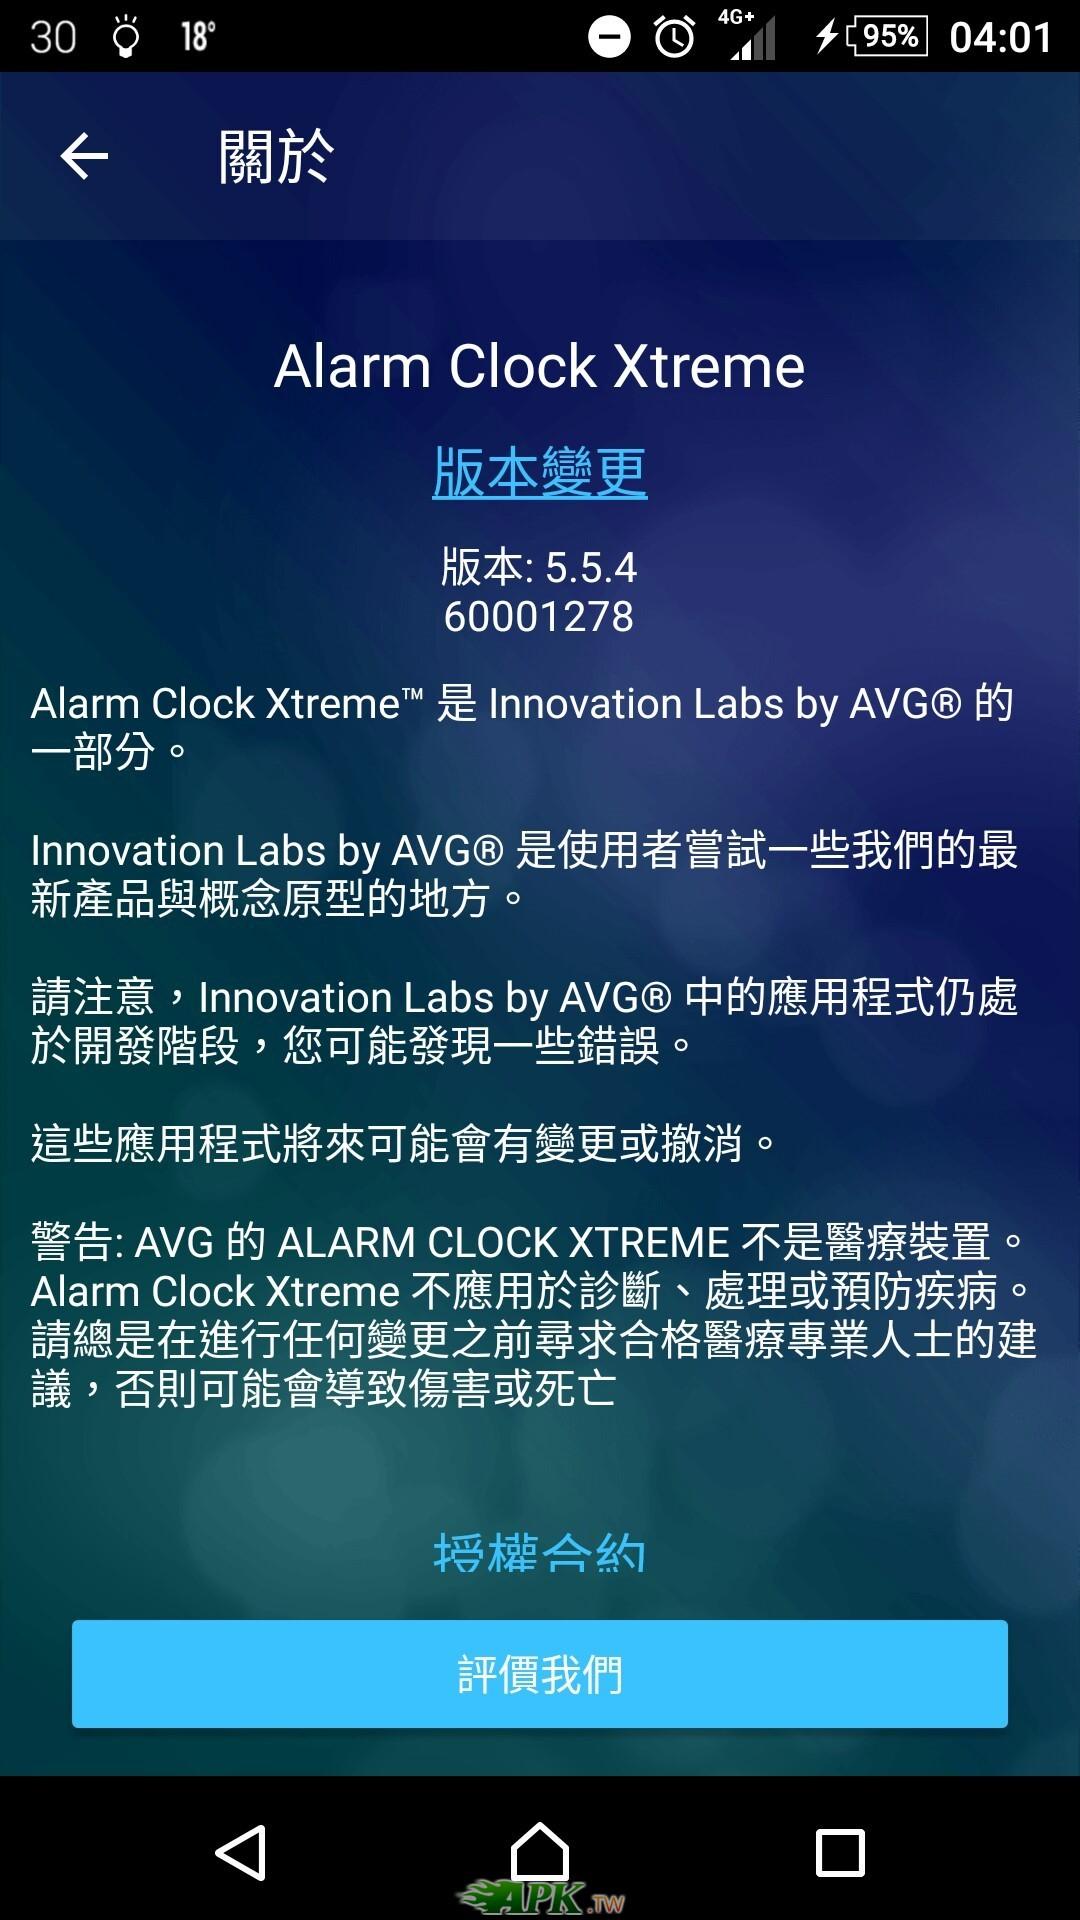 Alarm Clock Xtreme_170330_0010.jpg